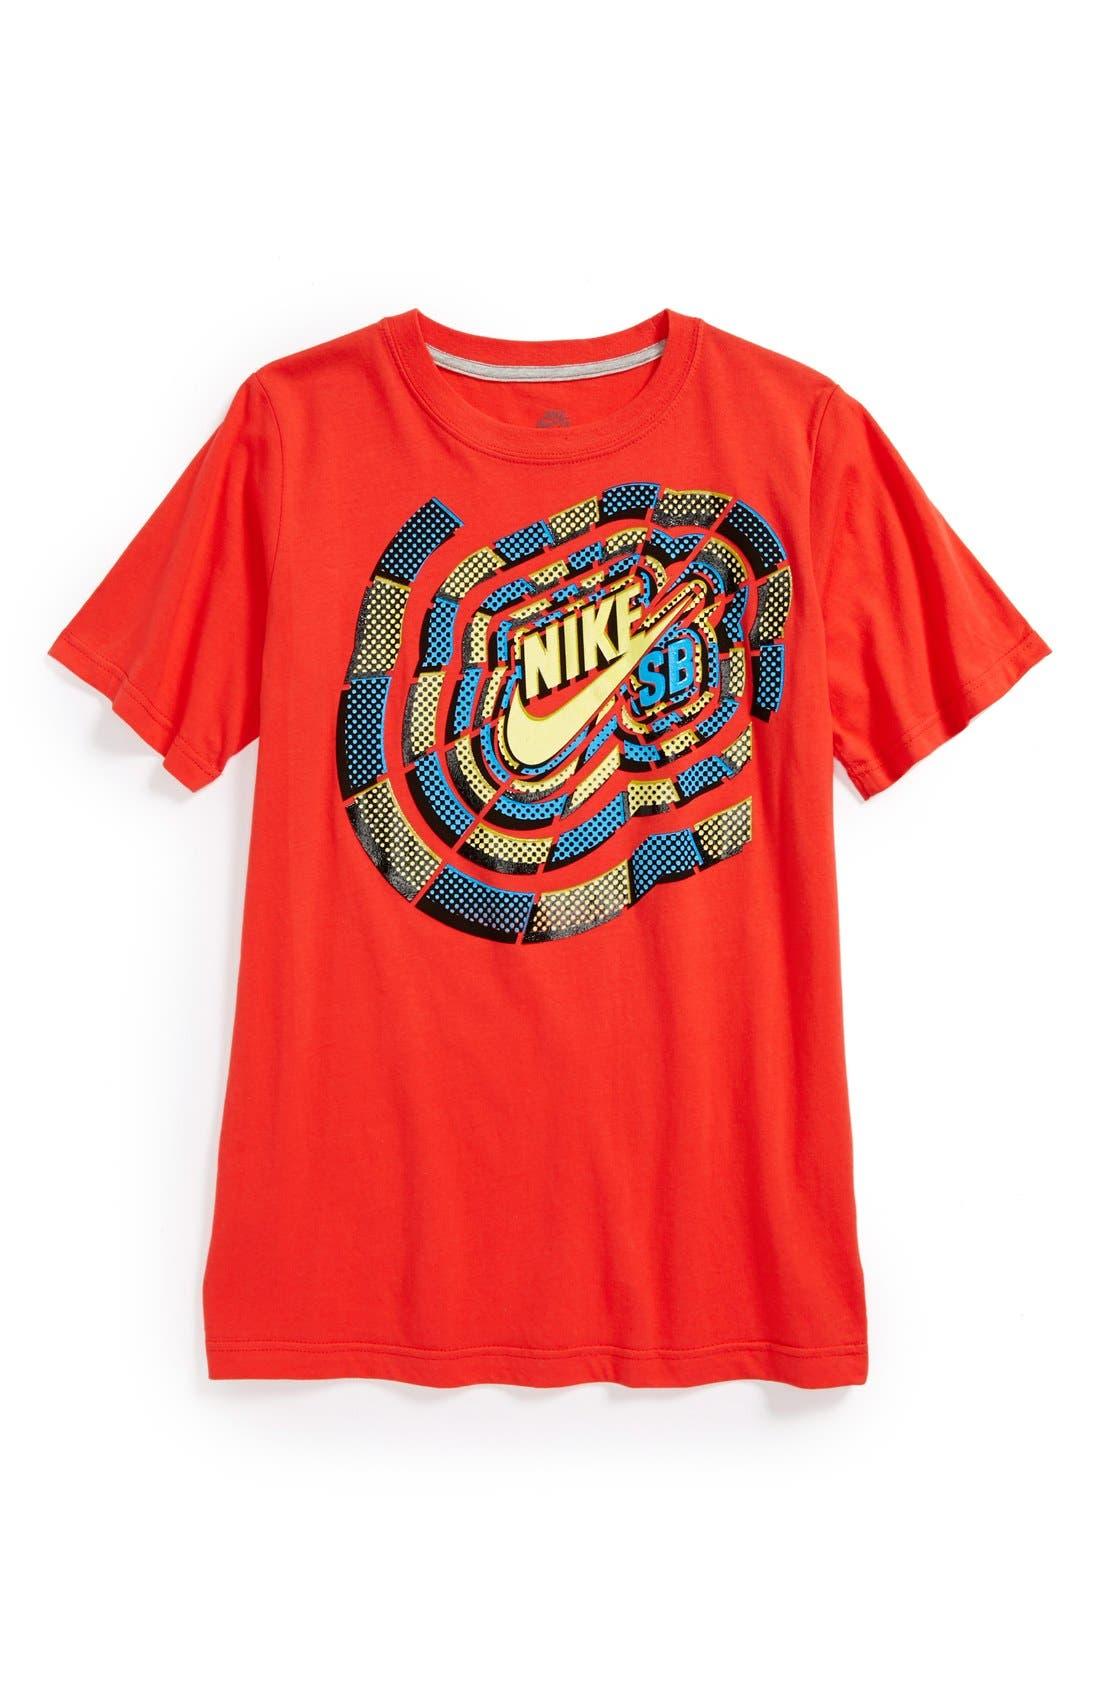 Alternate Image 1 Selected - Nike 'Sunburst SB' T-Shirt (Big Boys)